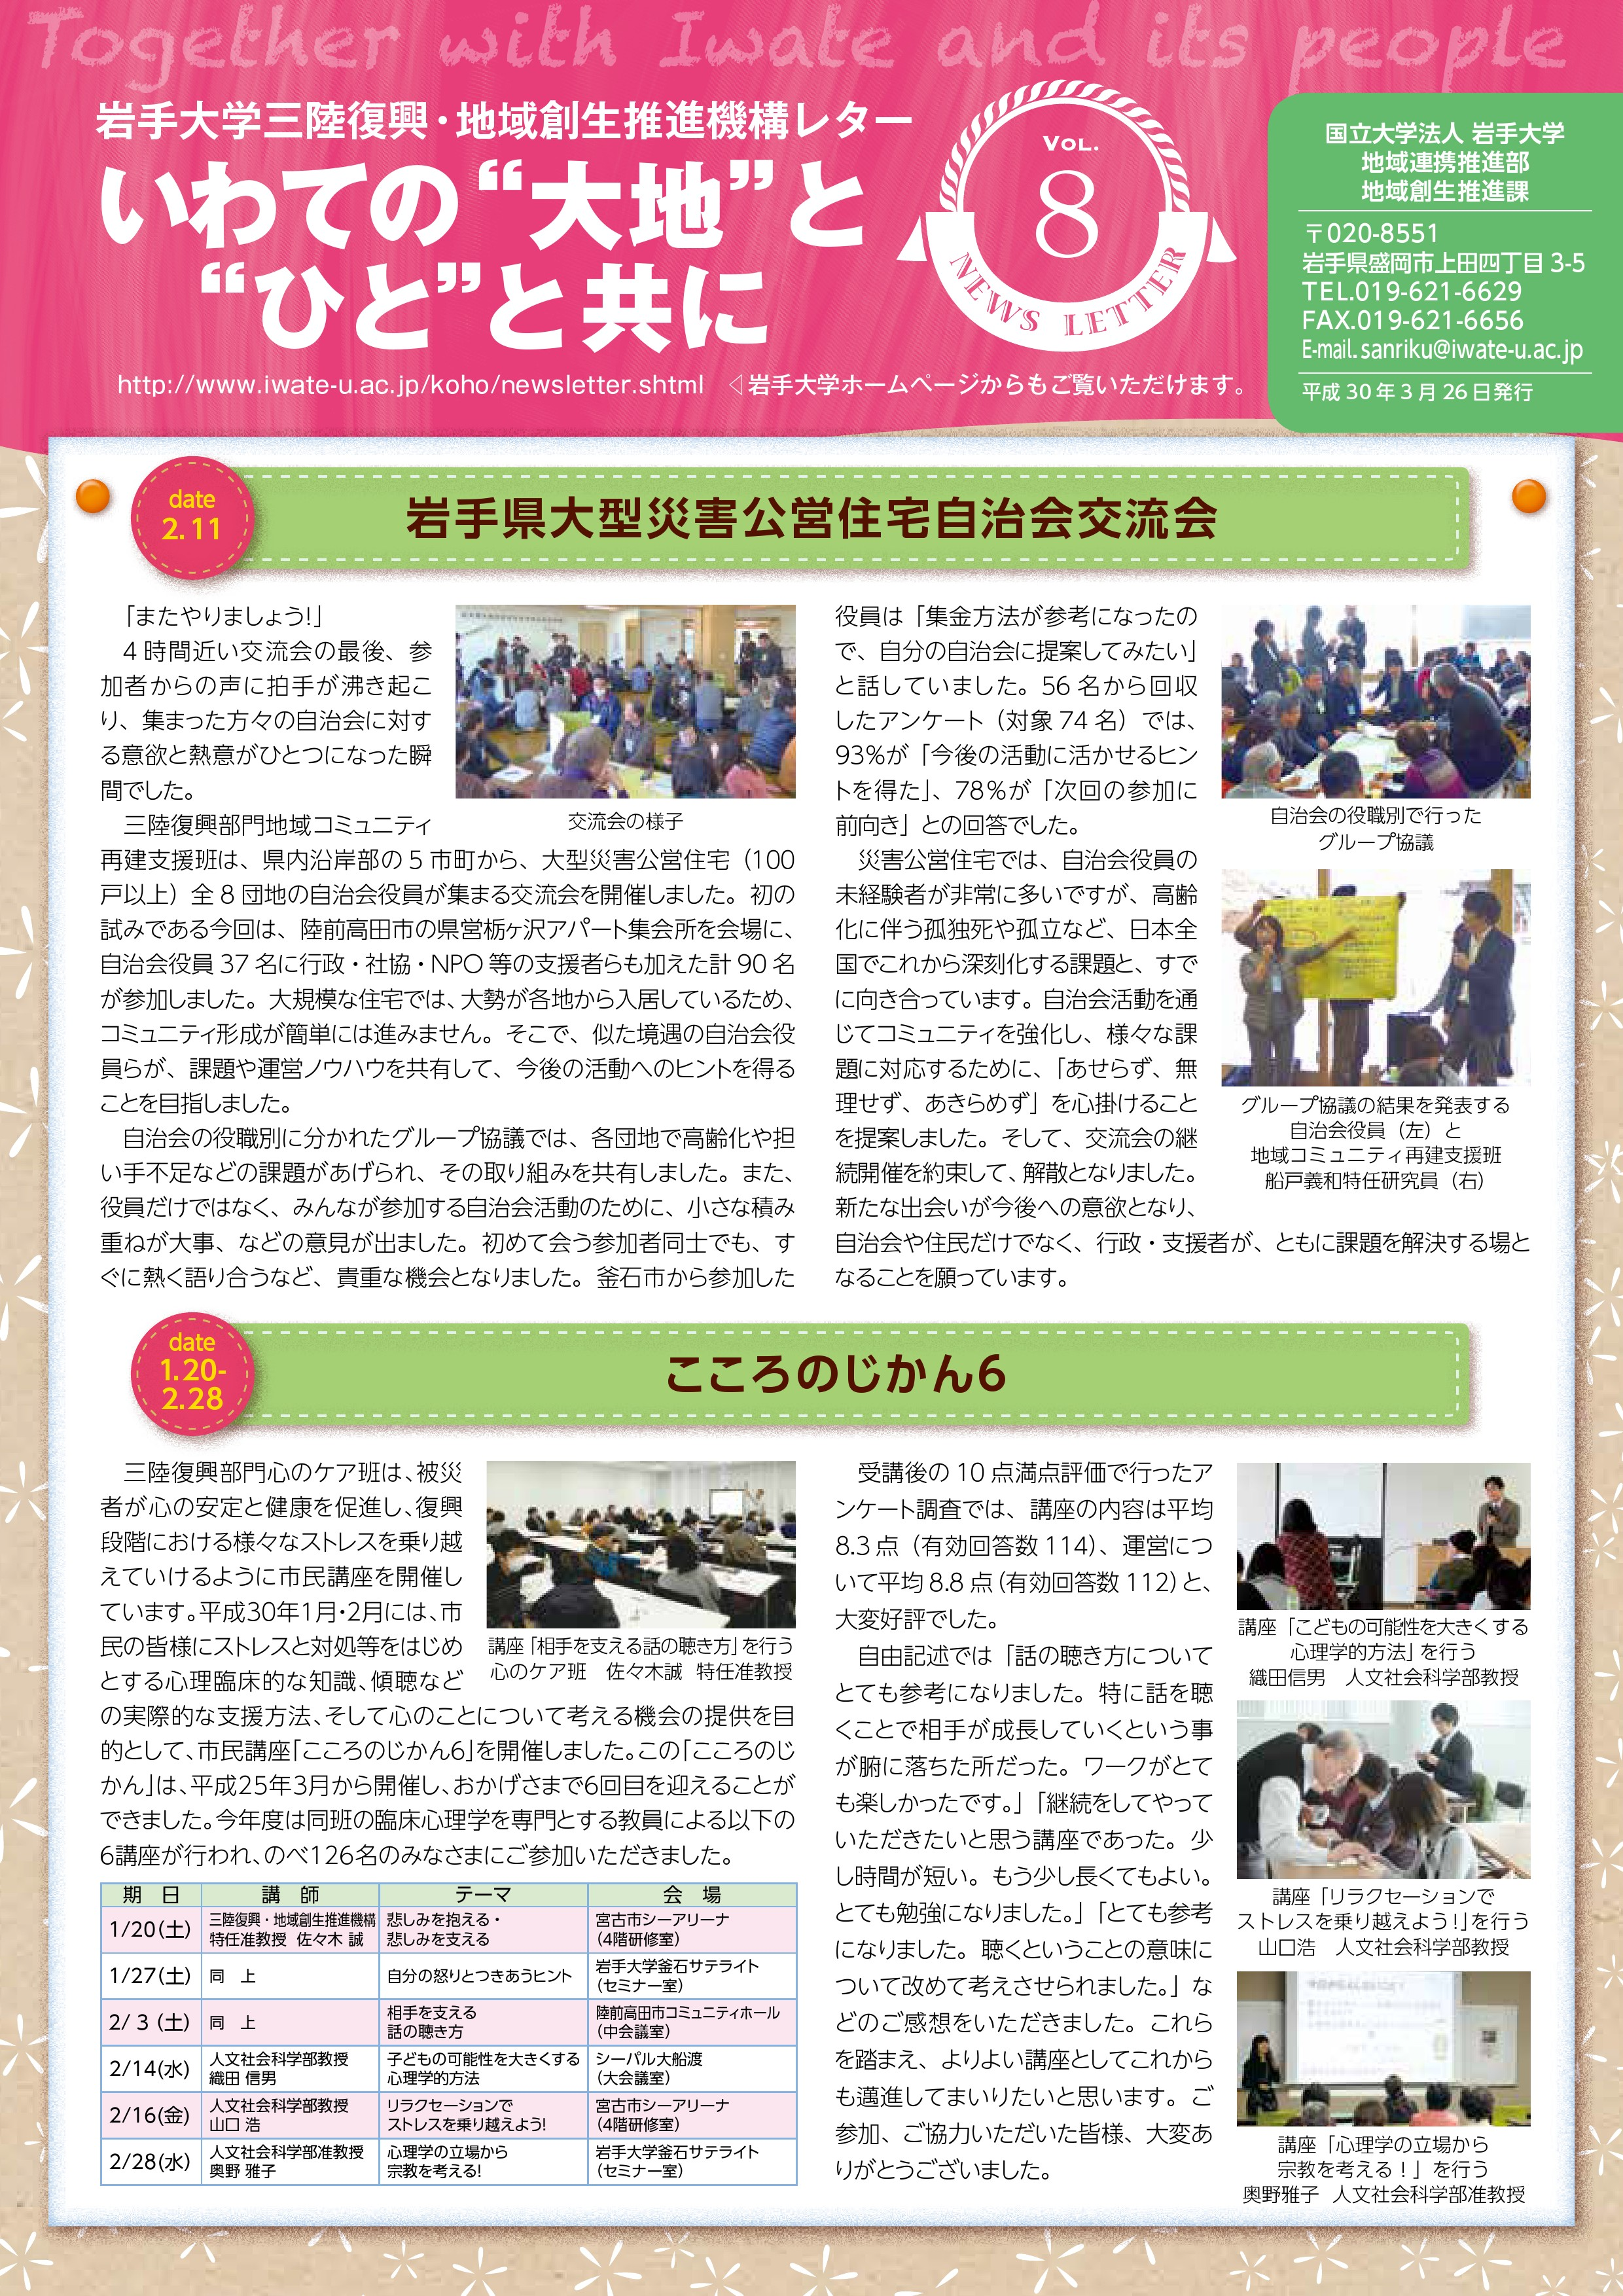 Vol.8 岩手県大型災害公営住宅自治会交流会